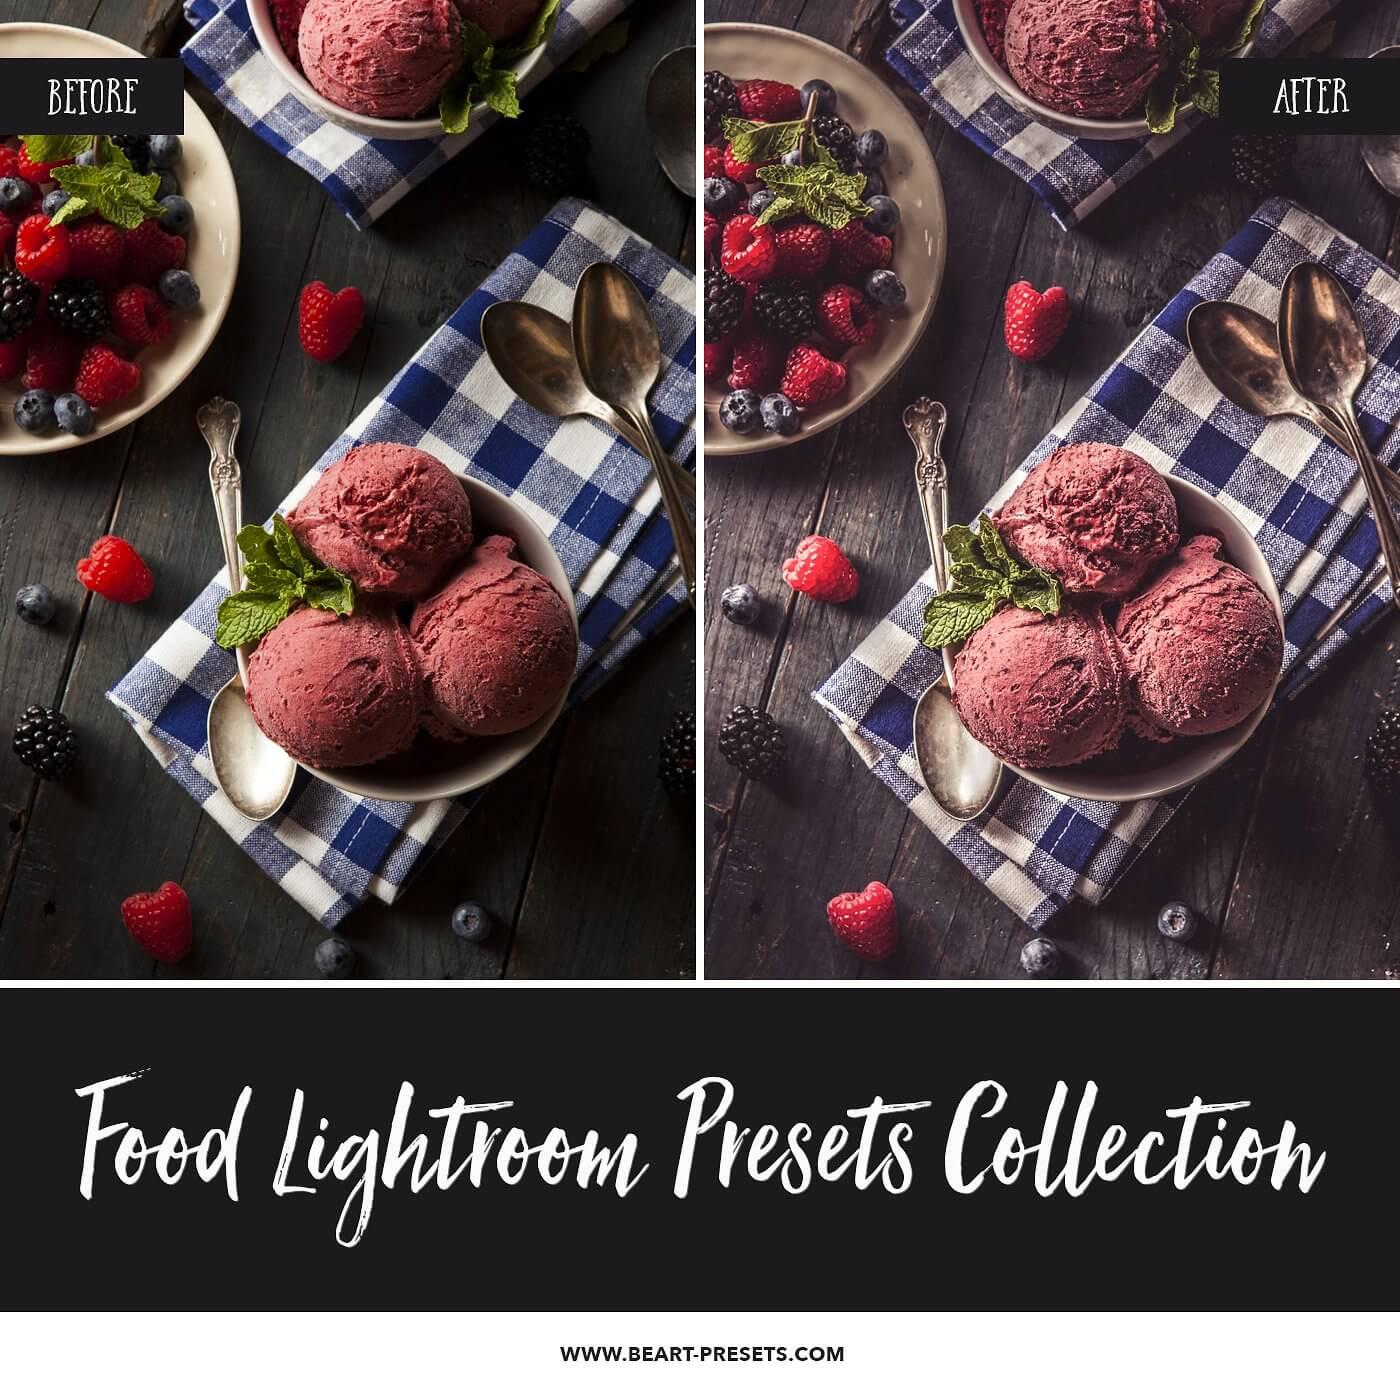 4de12ad73b4d2147ee130930e66f537d-1 50+ Best Photoshop Actions of 2019 design tips  Adobe Photoshop Actions